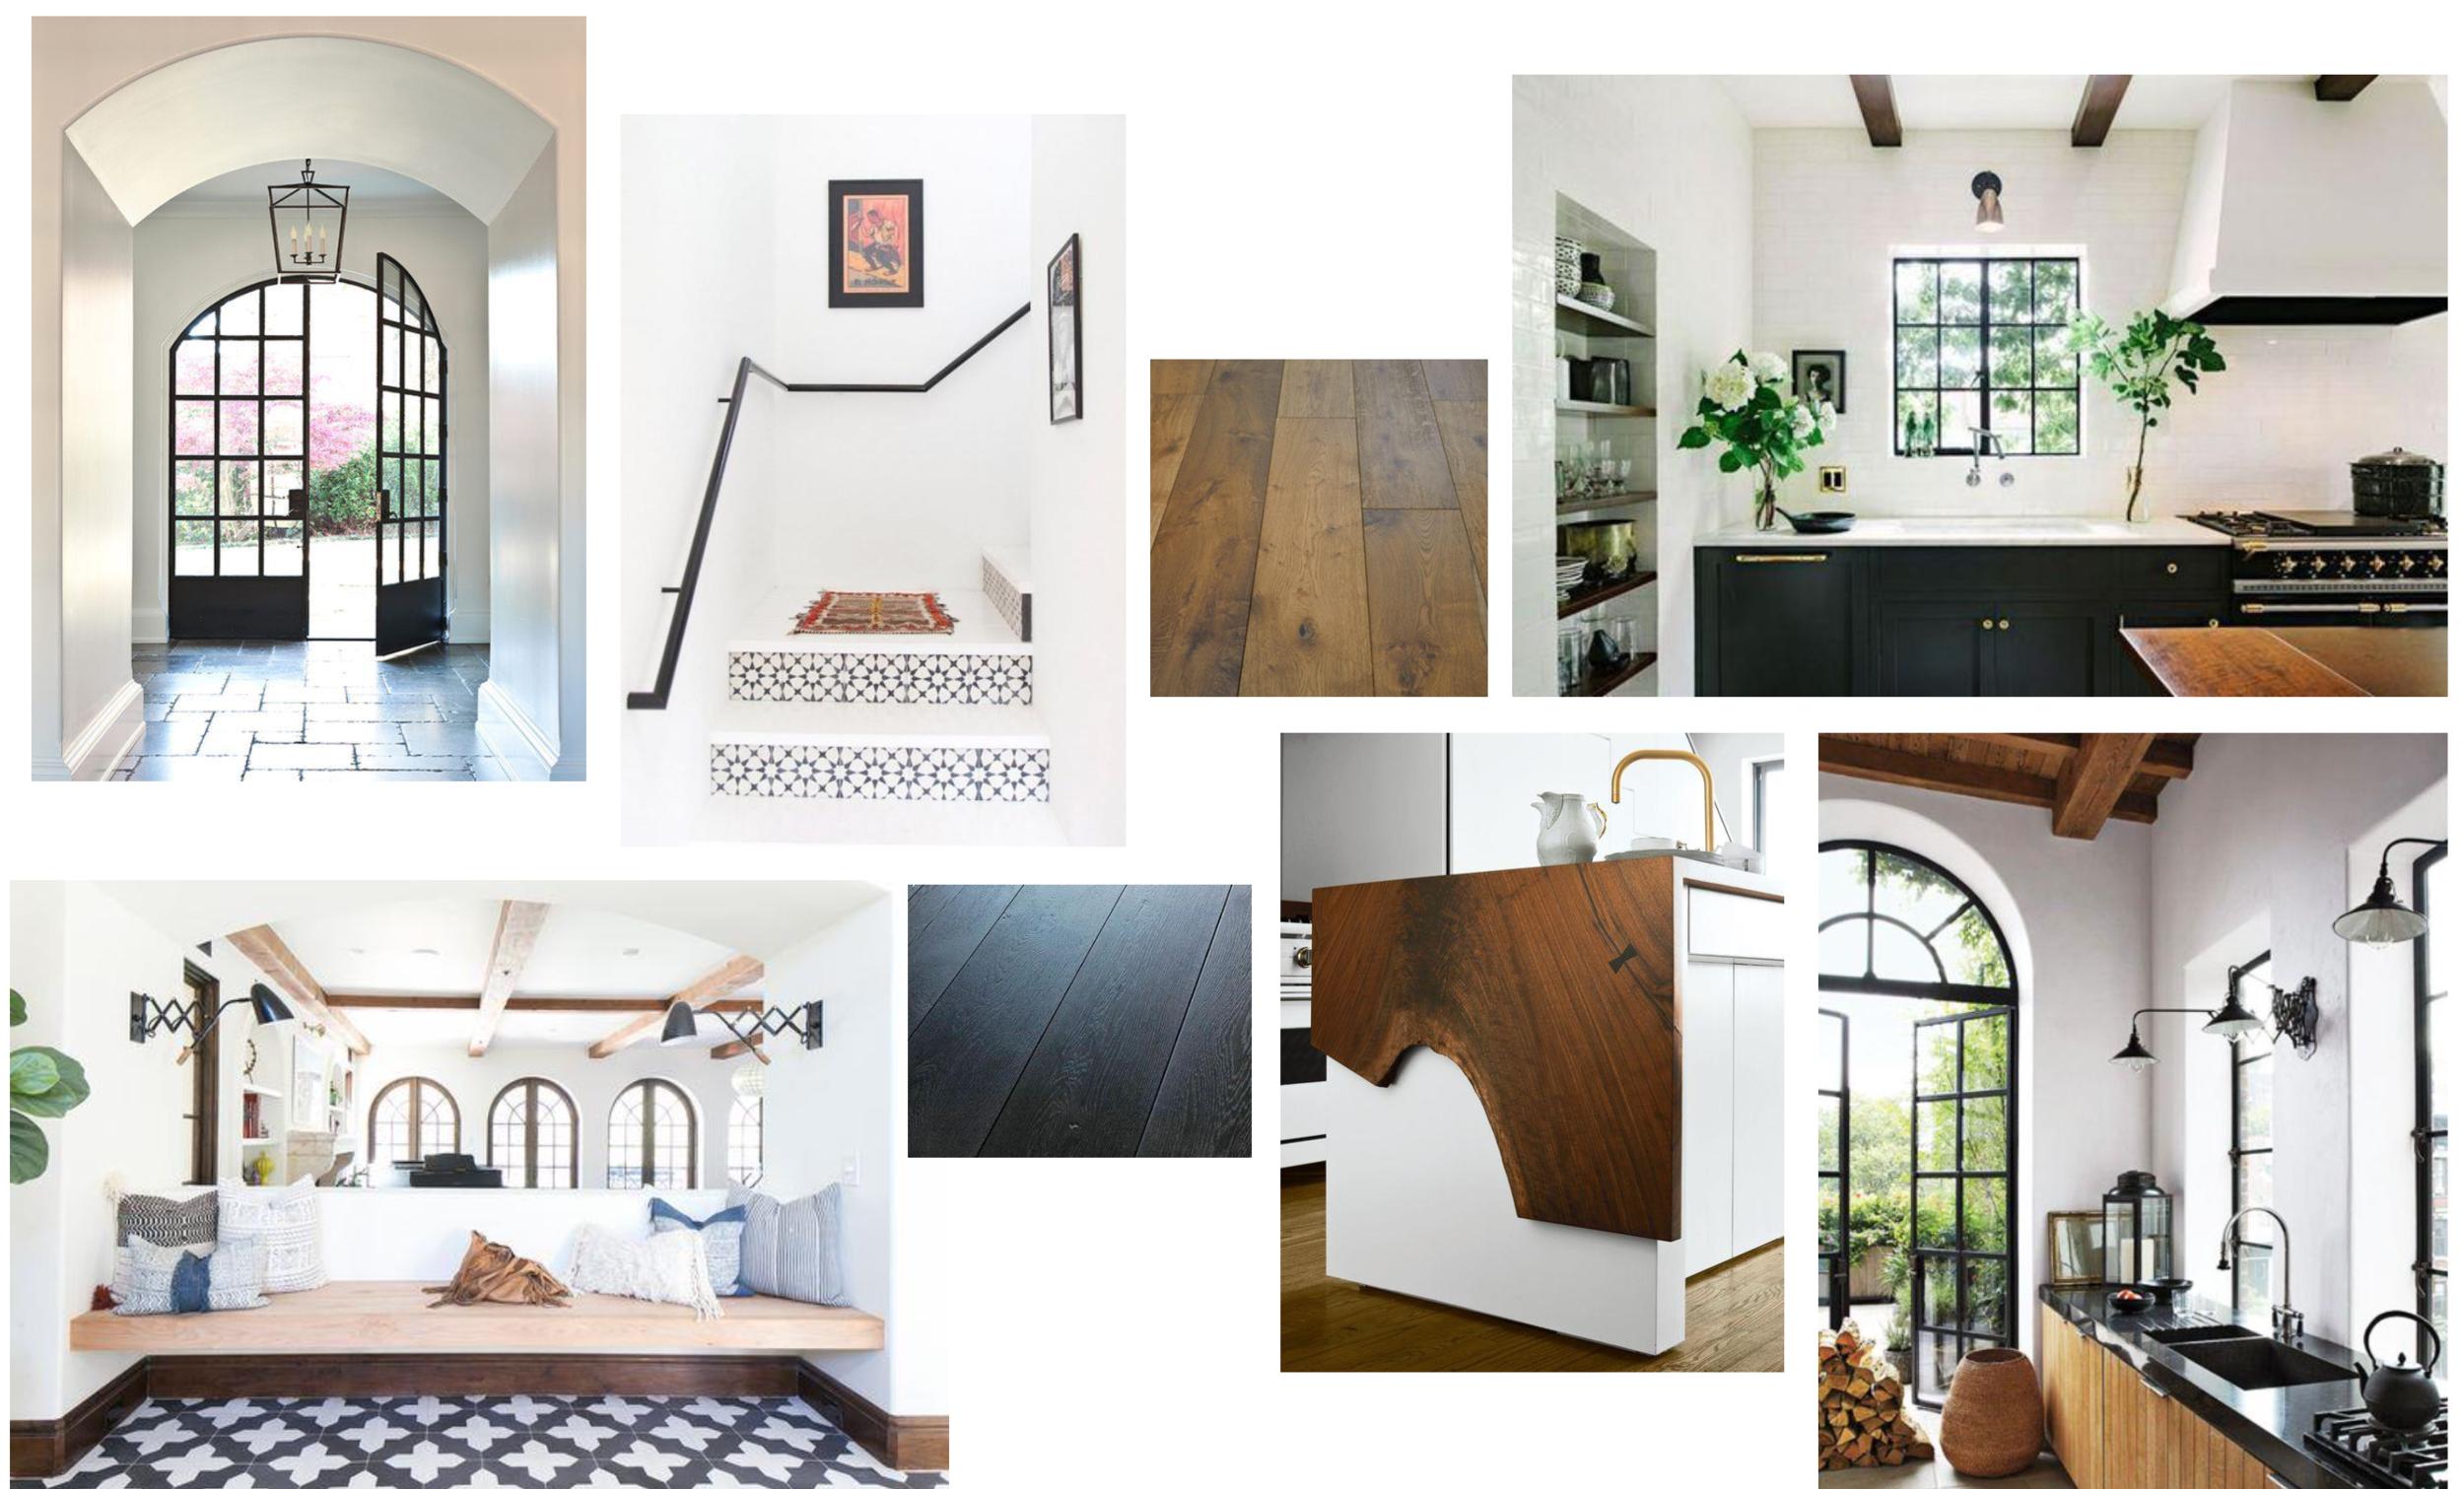 Interior Look & Feel (Communal Areas)